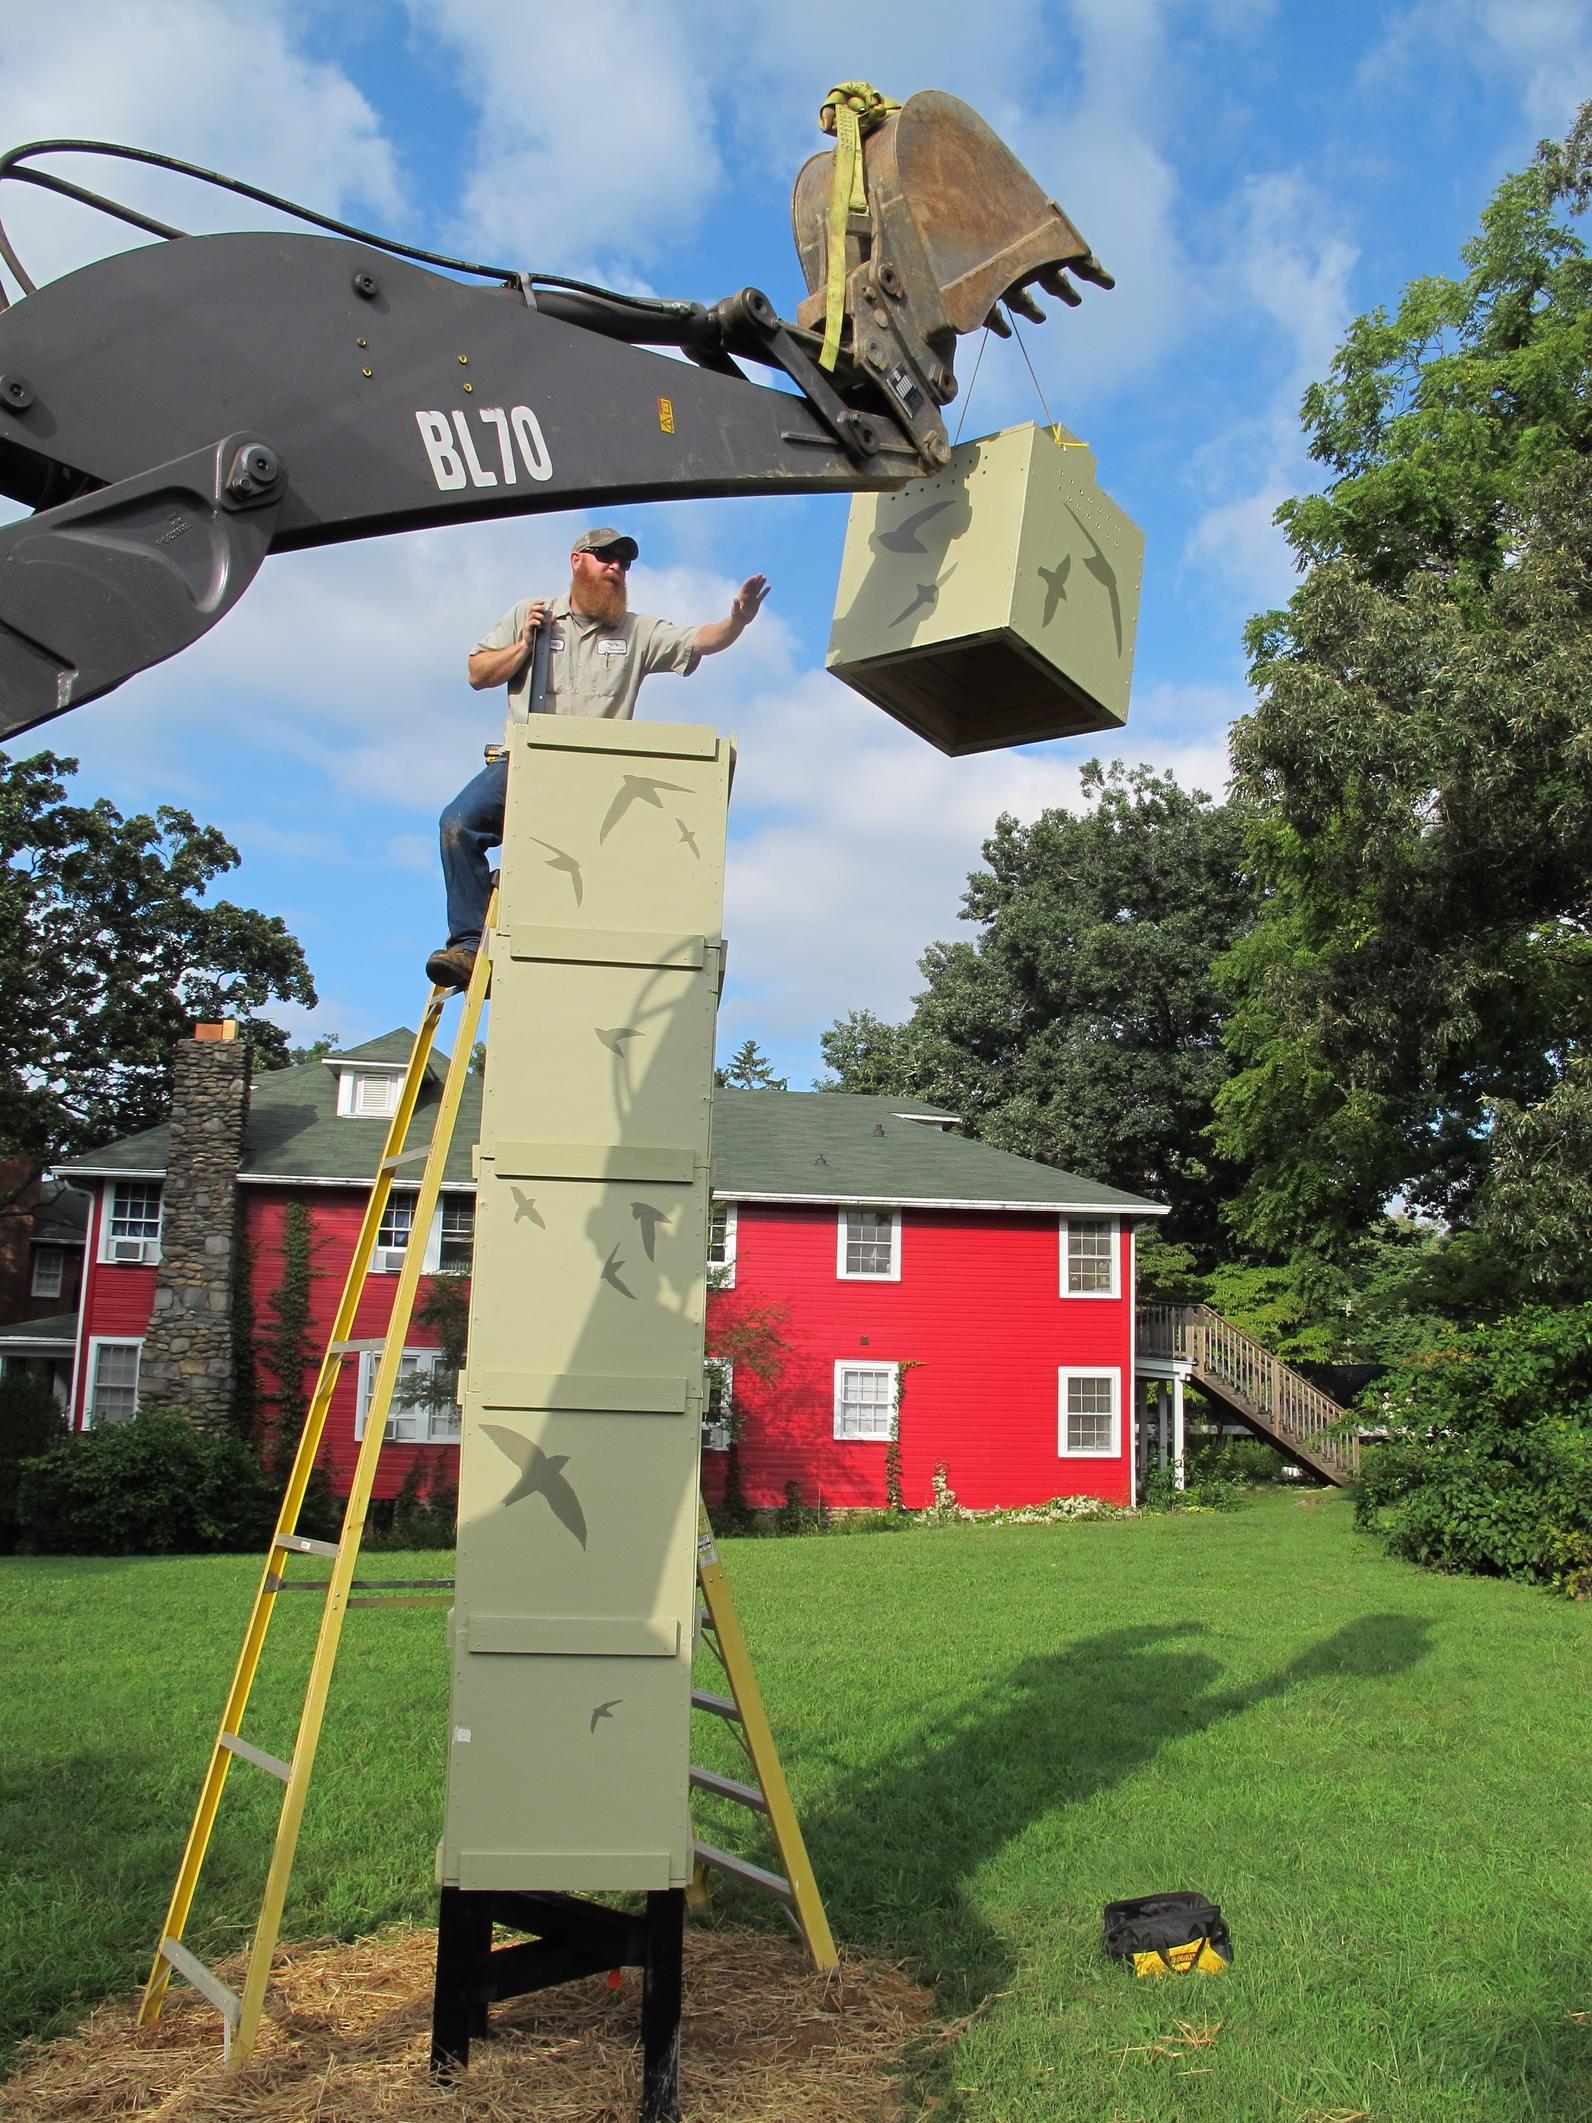 Build Your Own Chimney Swift Tower | Audubon North Carolina